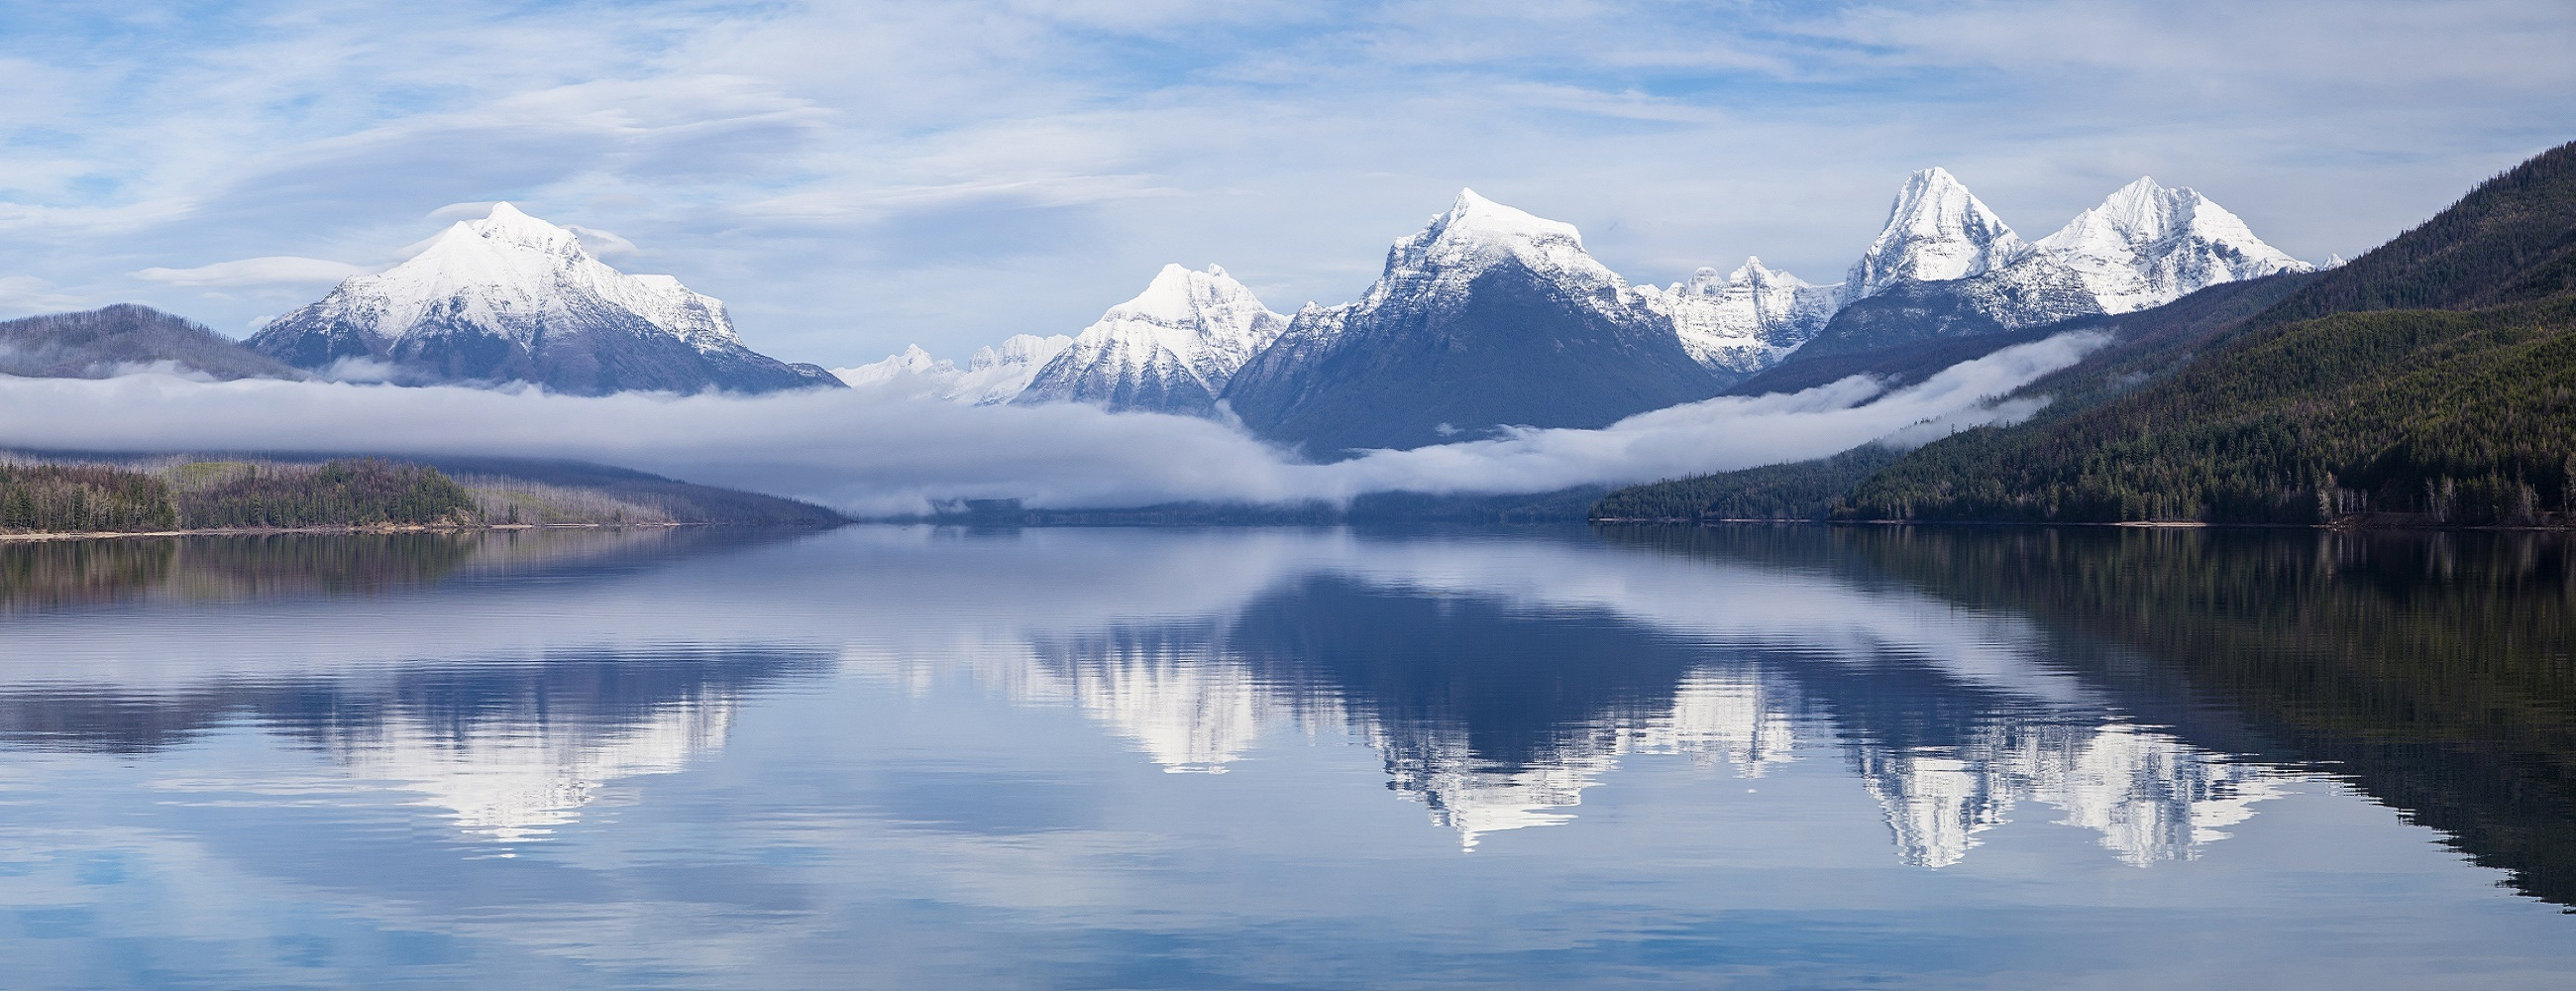 California Iphone 7 Wallpaper Lake Mcdonald Glacier National Park Montana Usa Wallpaper